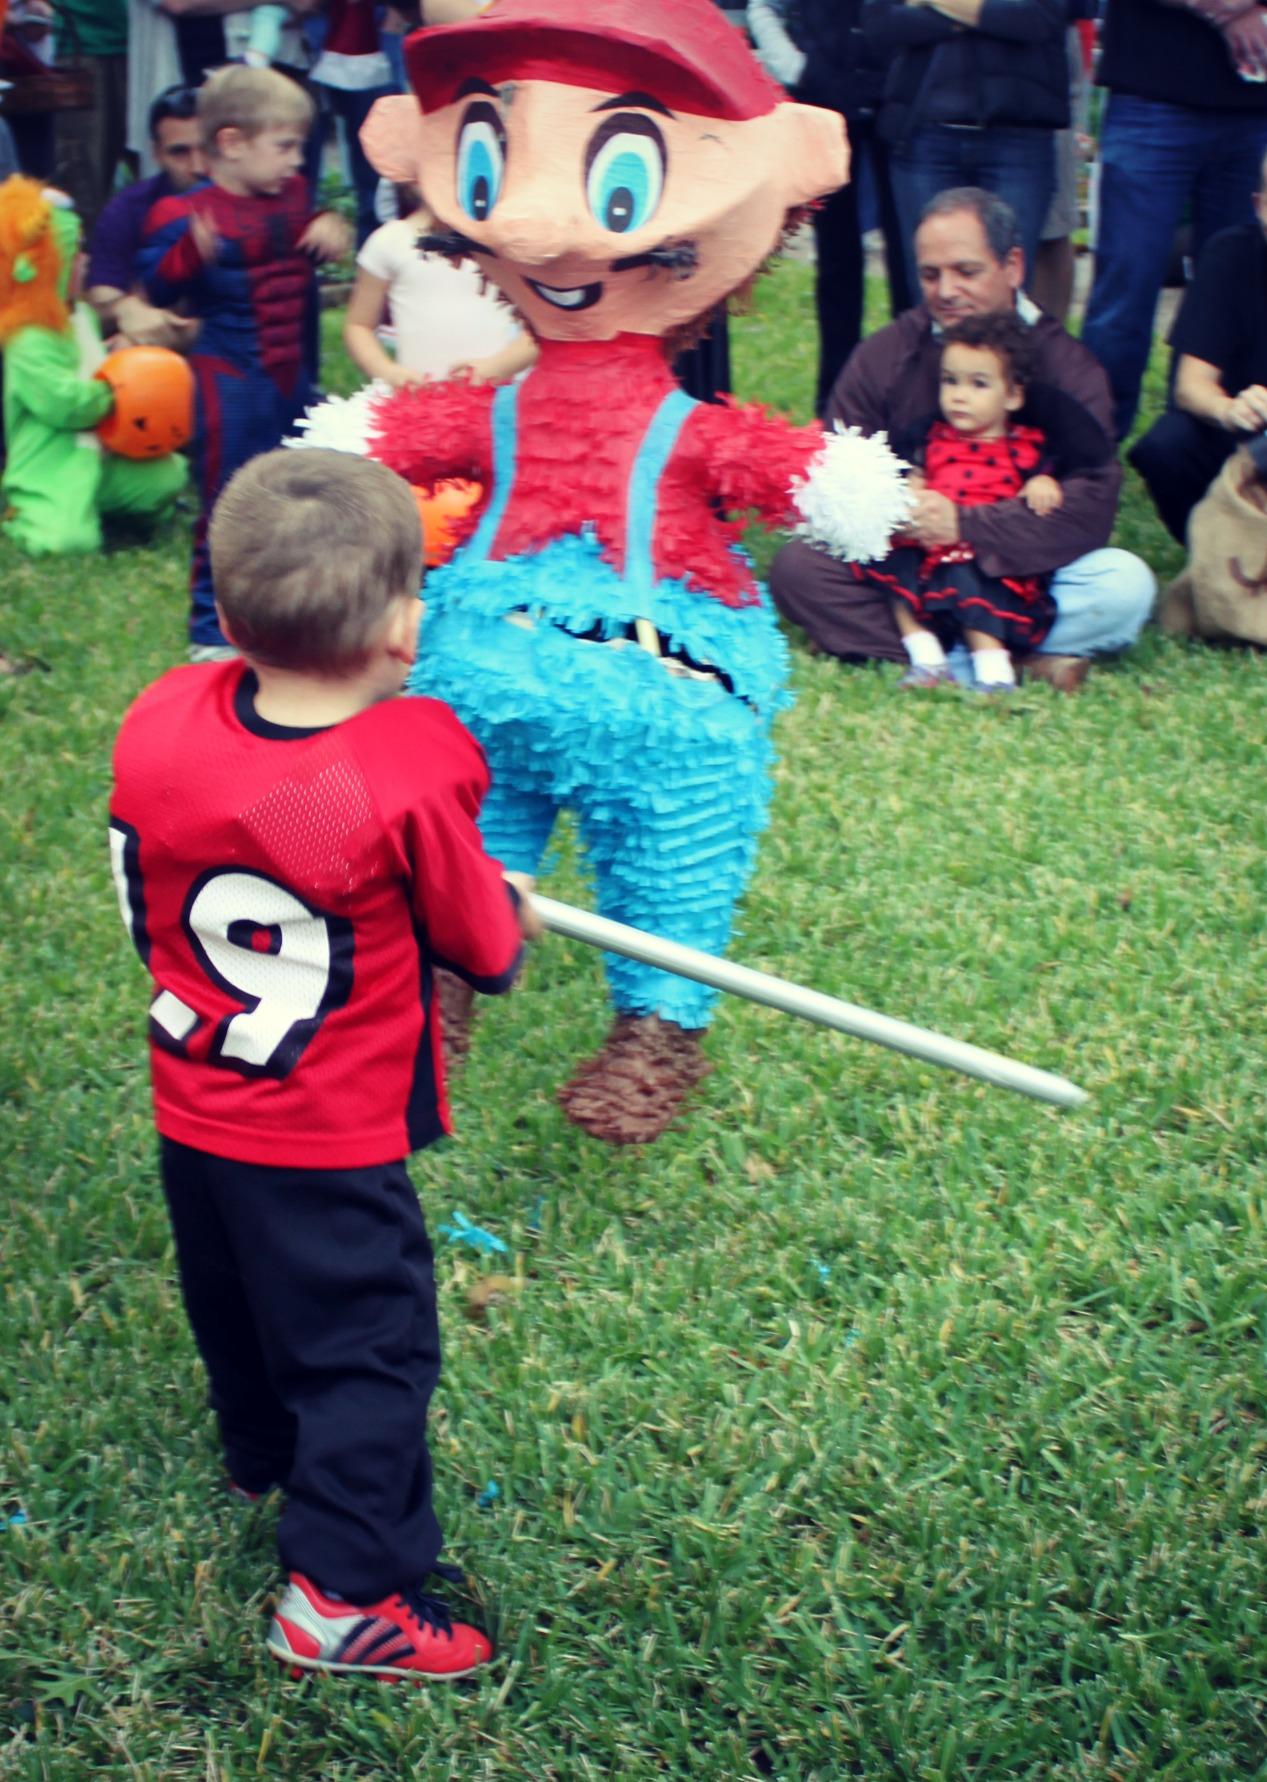 Easy DIY Football Themed Halloween Family Halloween Costumes - Bare